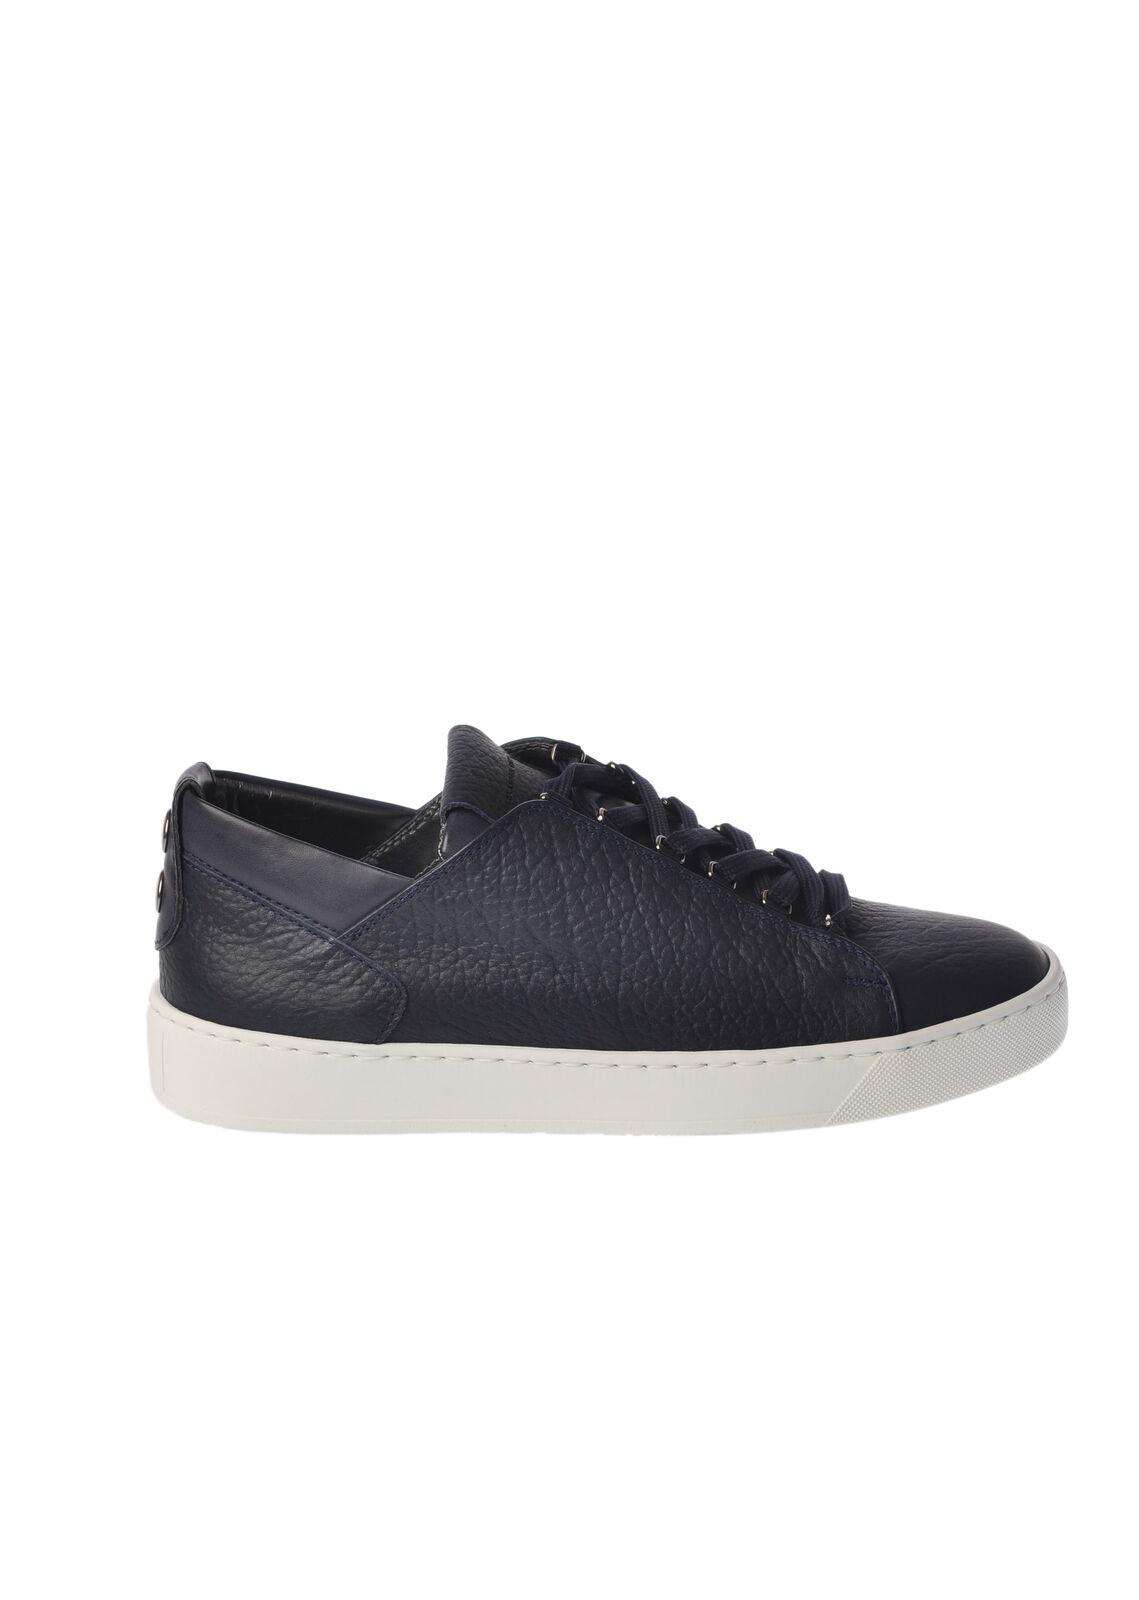 Scarpe casual da uomo  Alexander Smith - Shoes-Sneakers low - Man - Blue - 4992215G180727